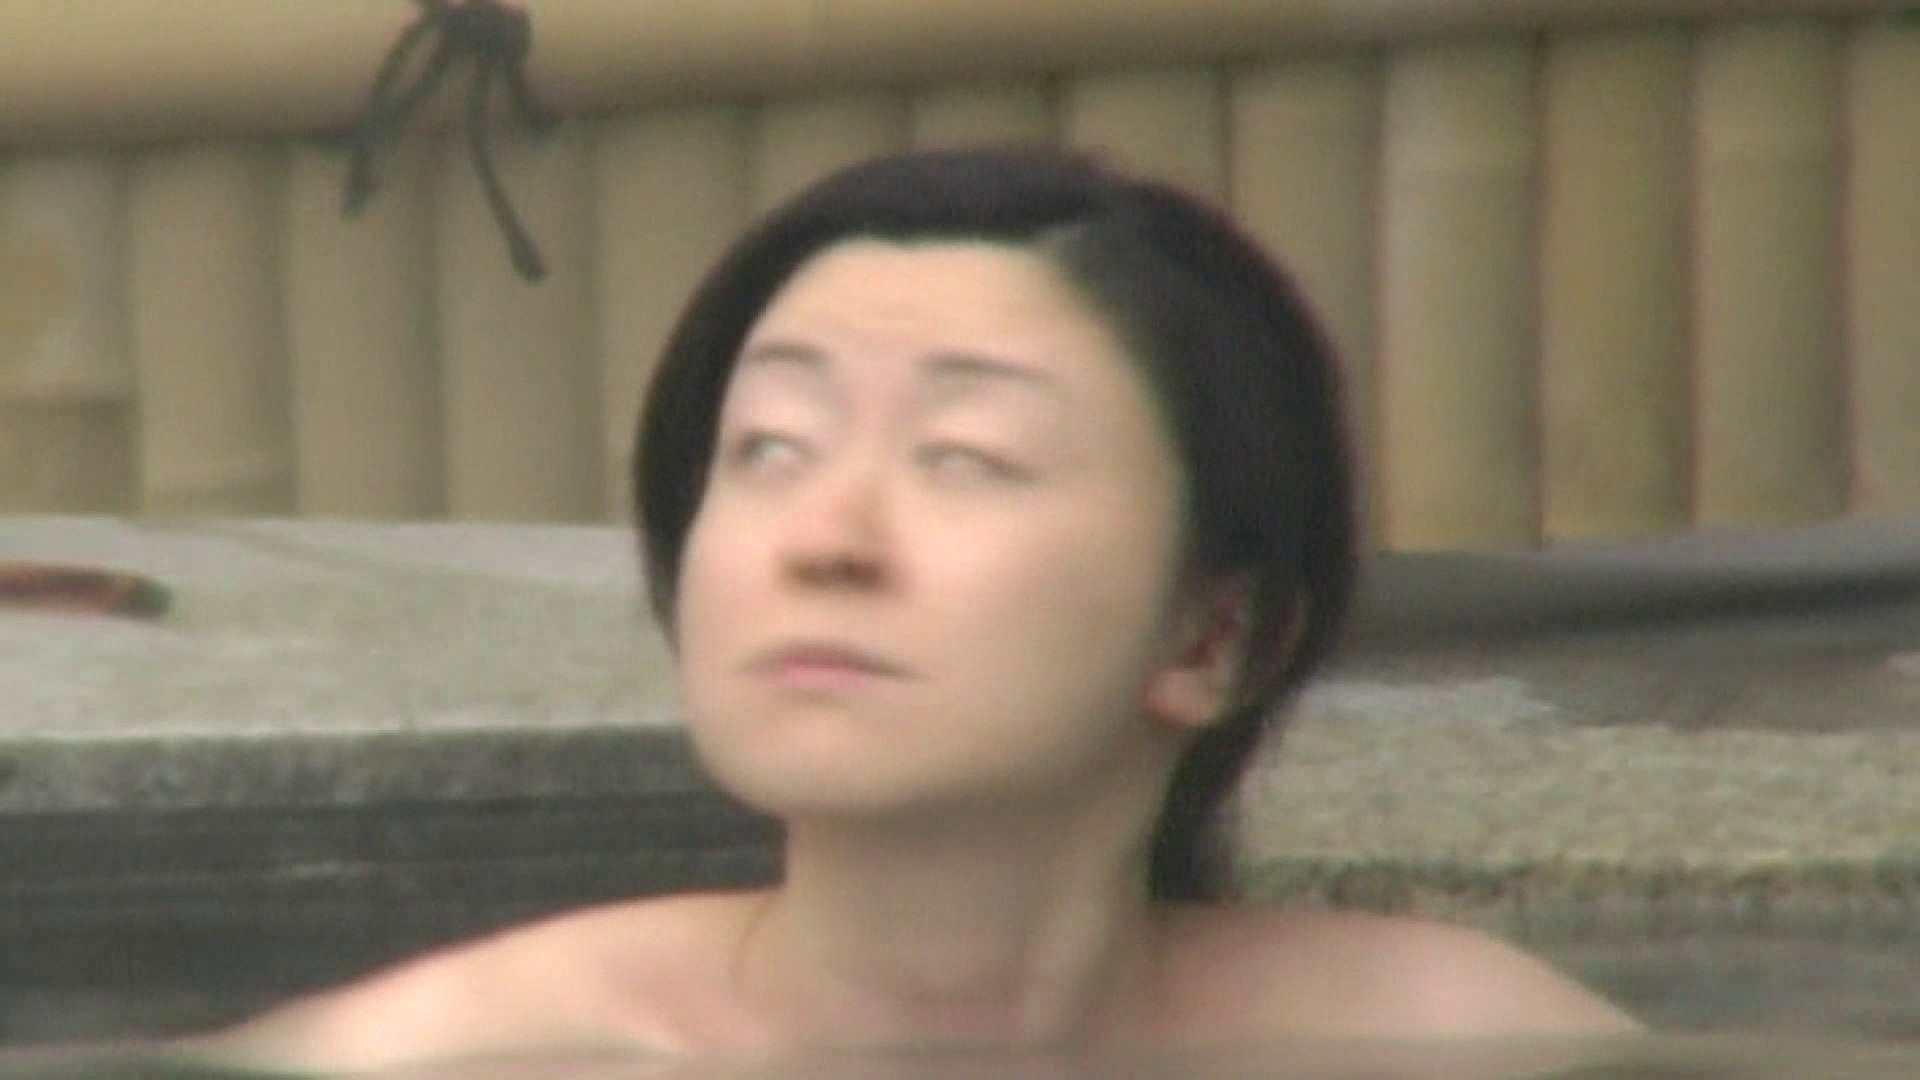 Aquaな露天風呂Vol.548 女体盗撮 | OL女体  70連発 28